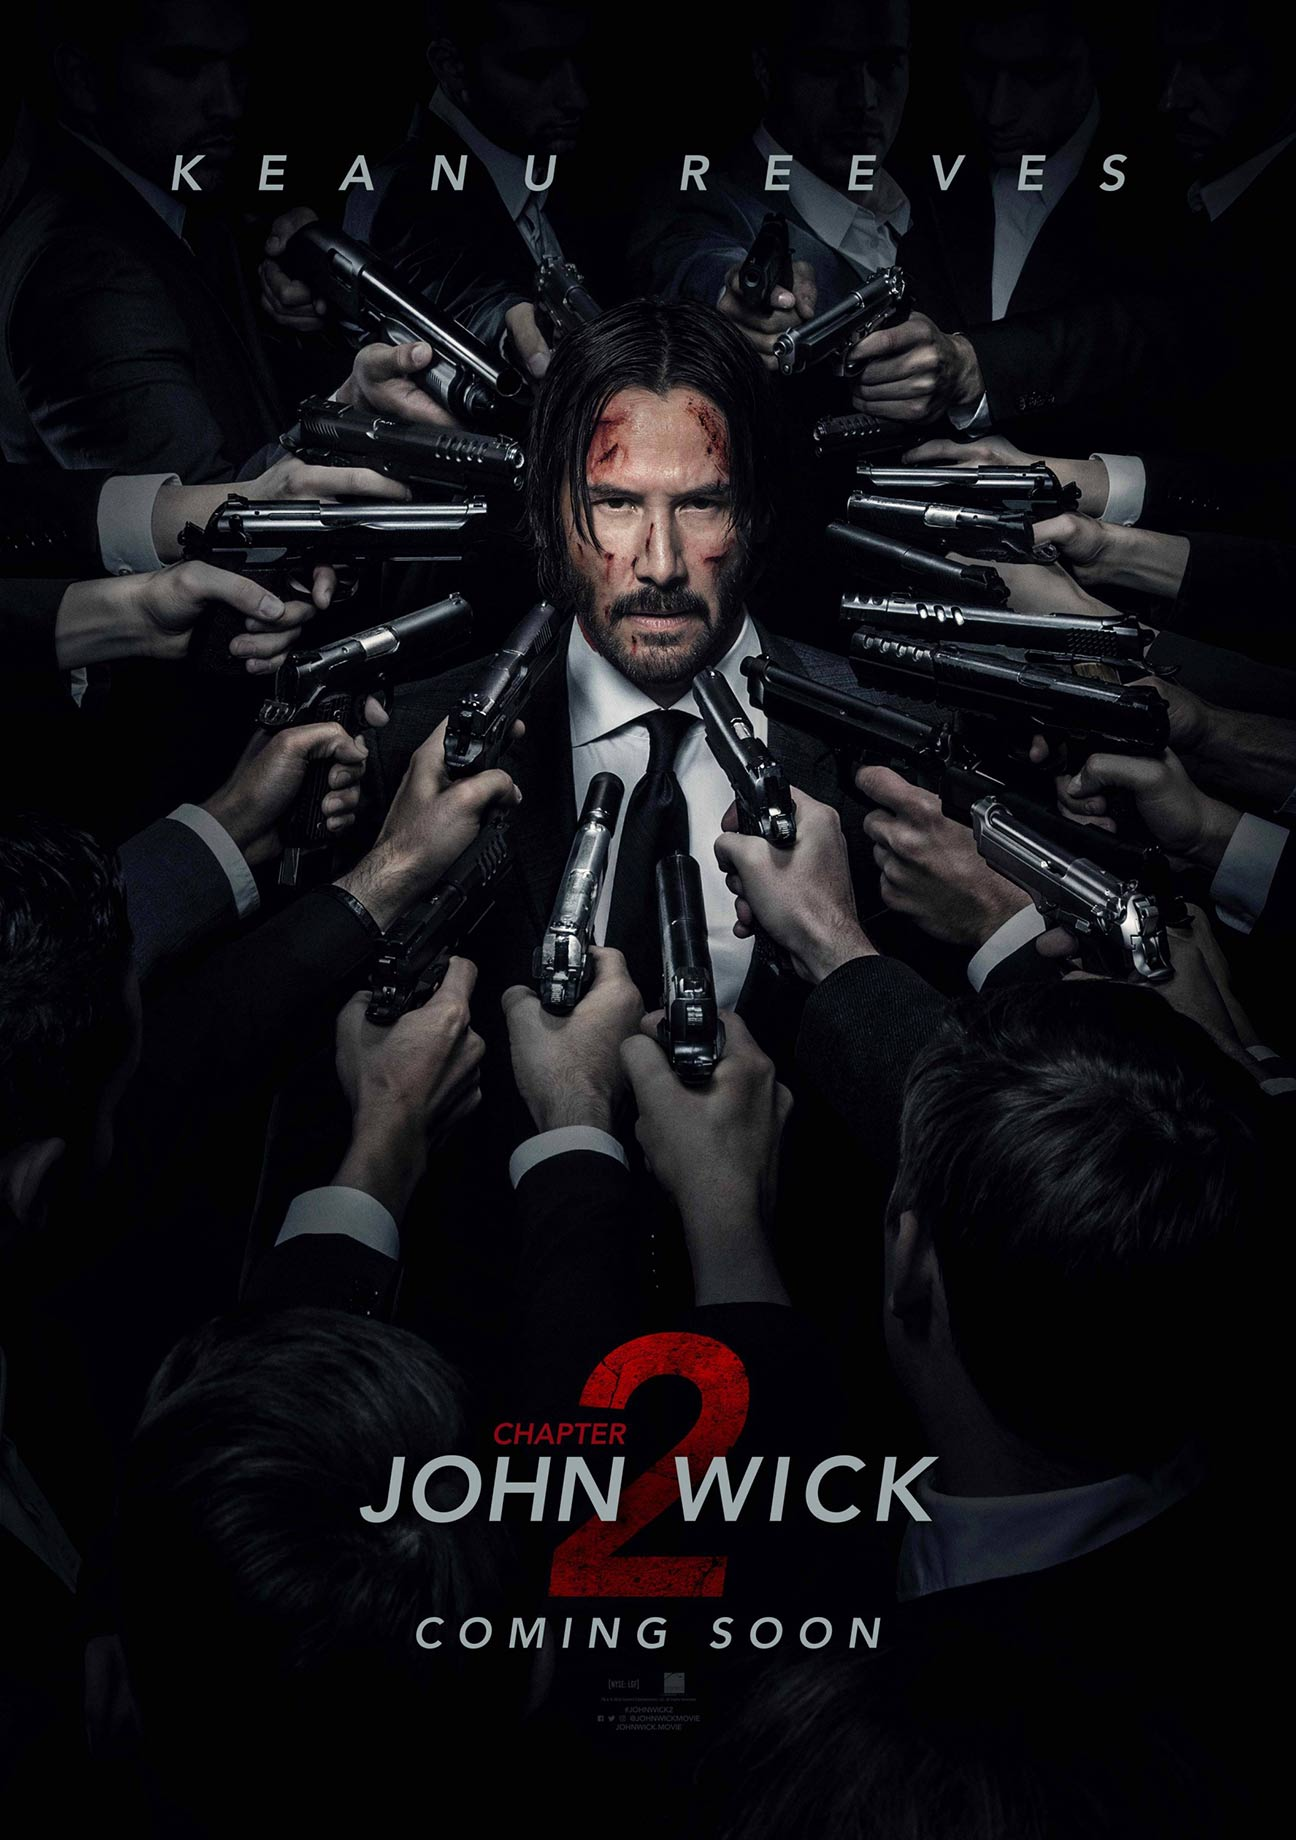 John Wick: Chapter 2 Poster #2